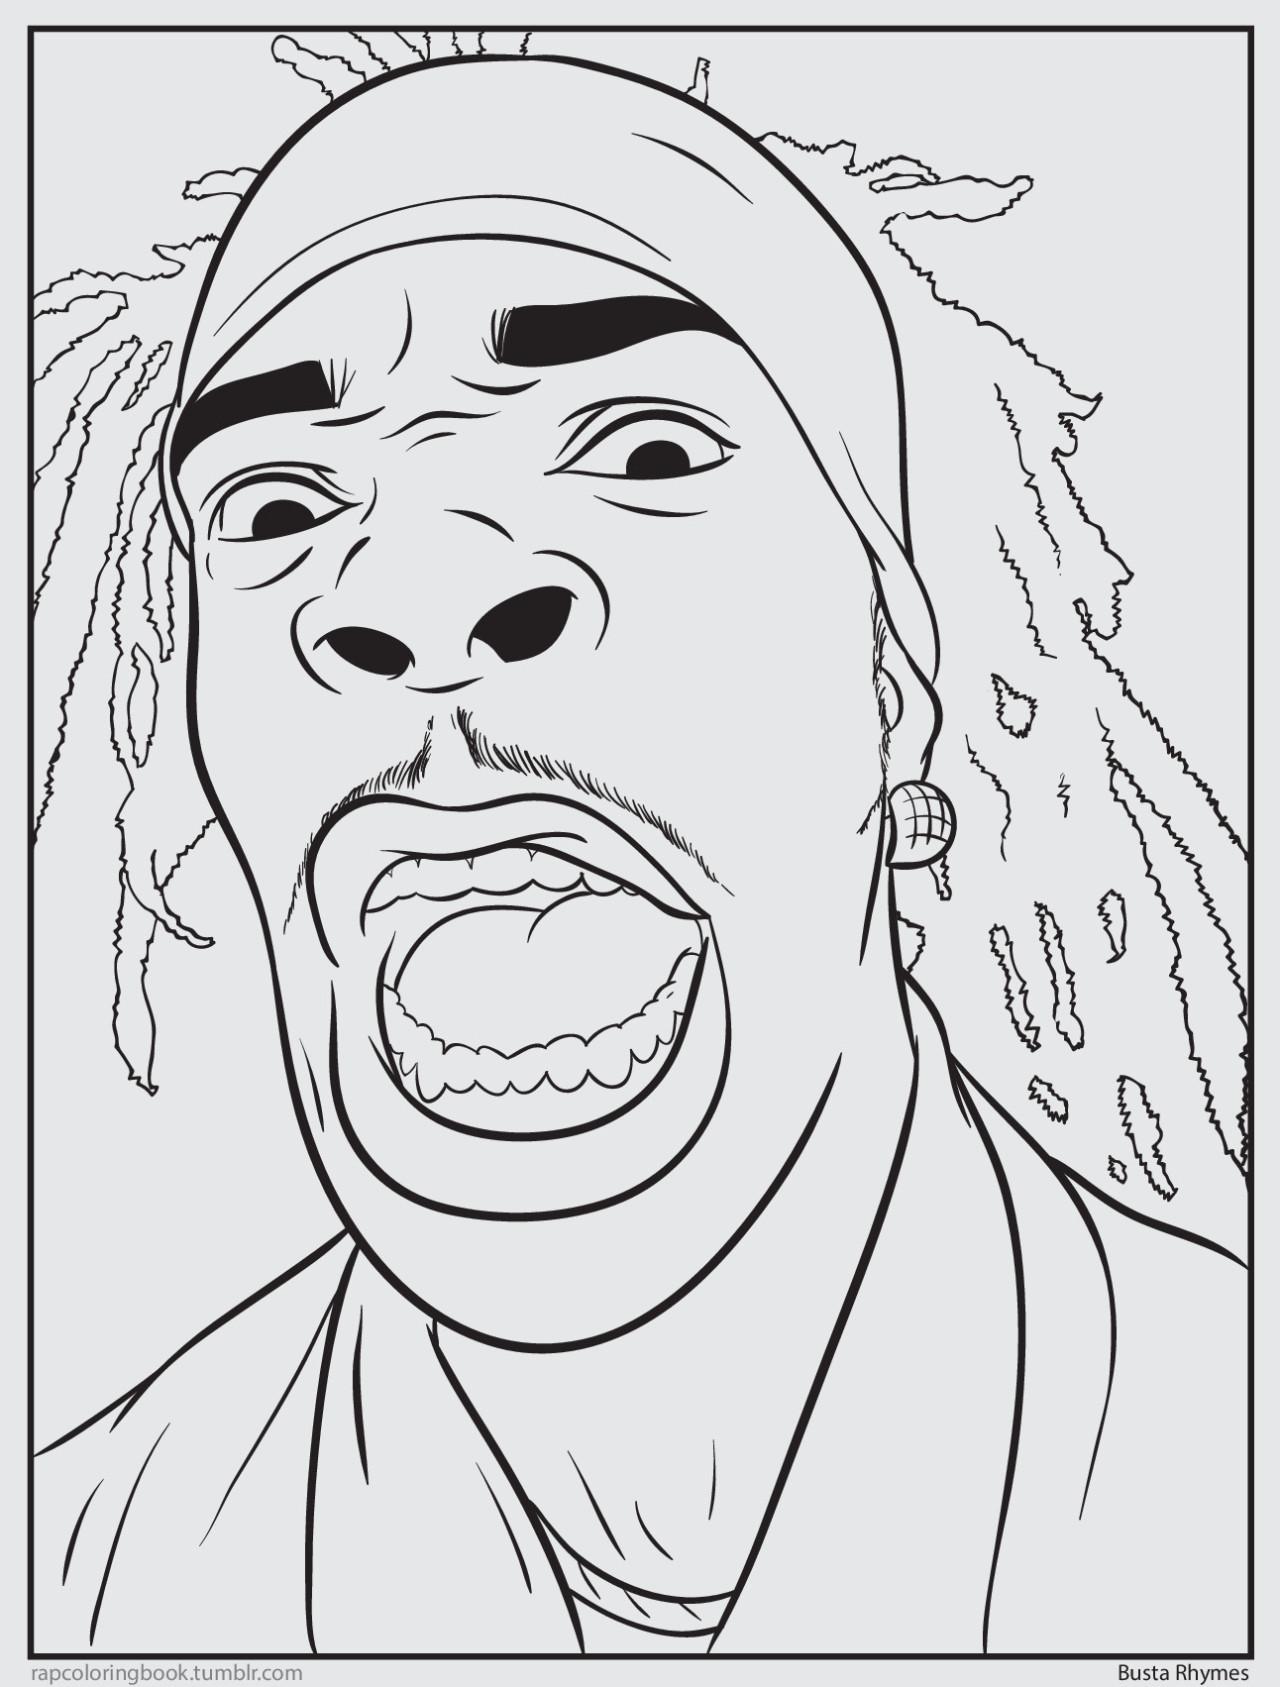 Depressed drawings tumblr sketch coloring page